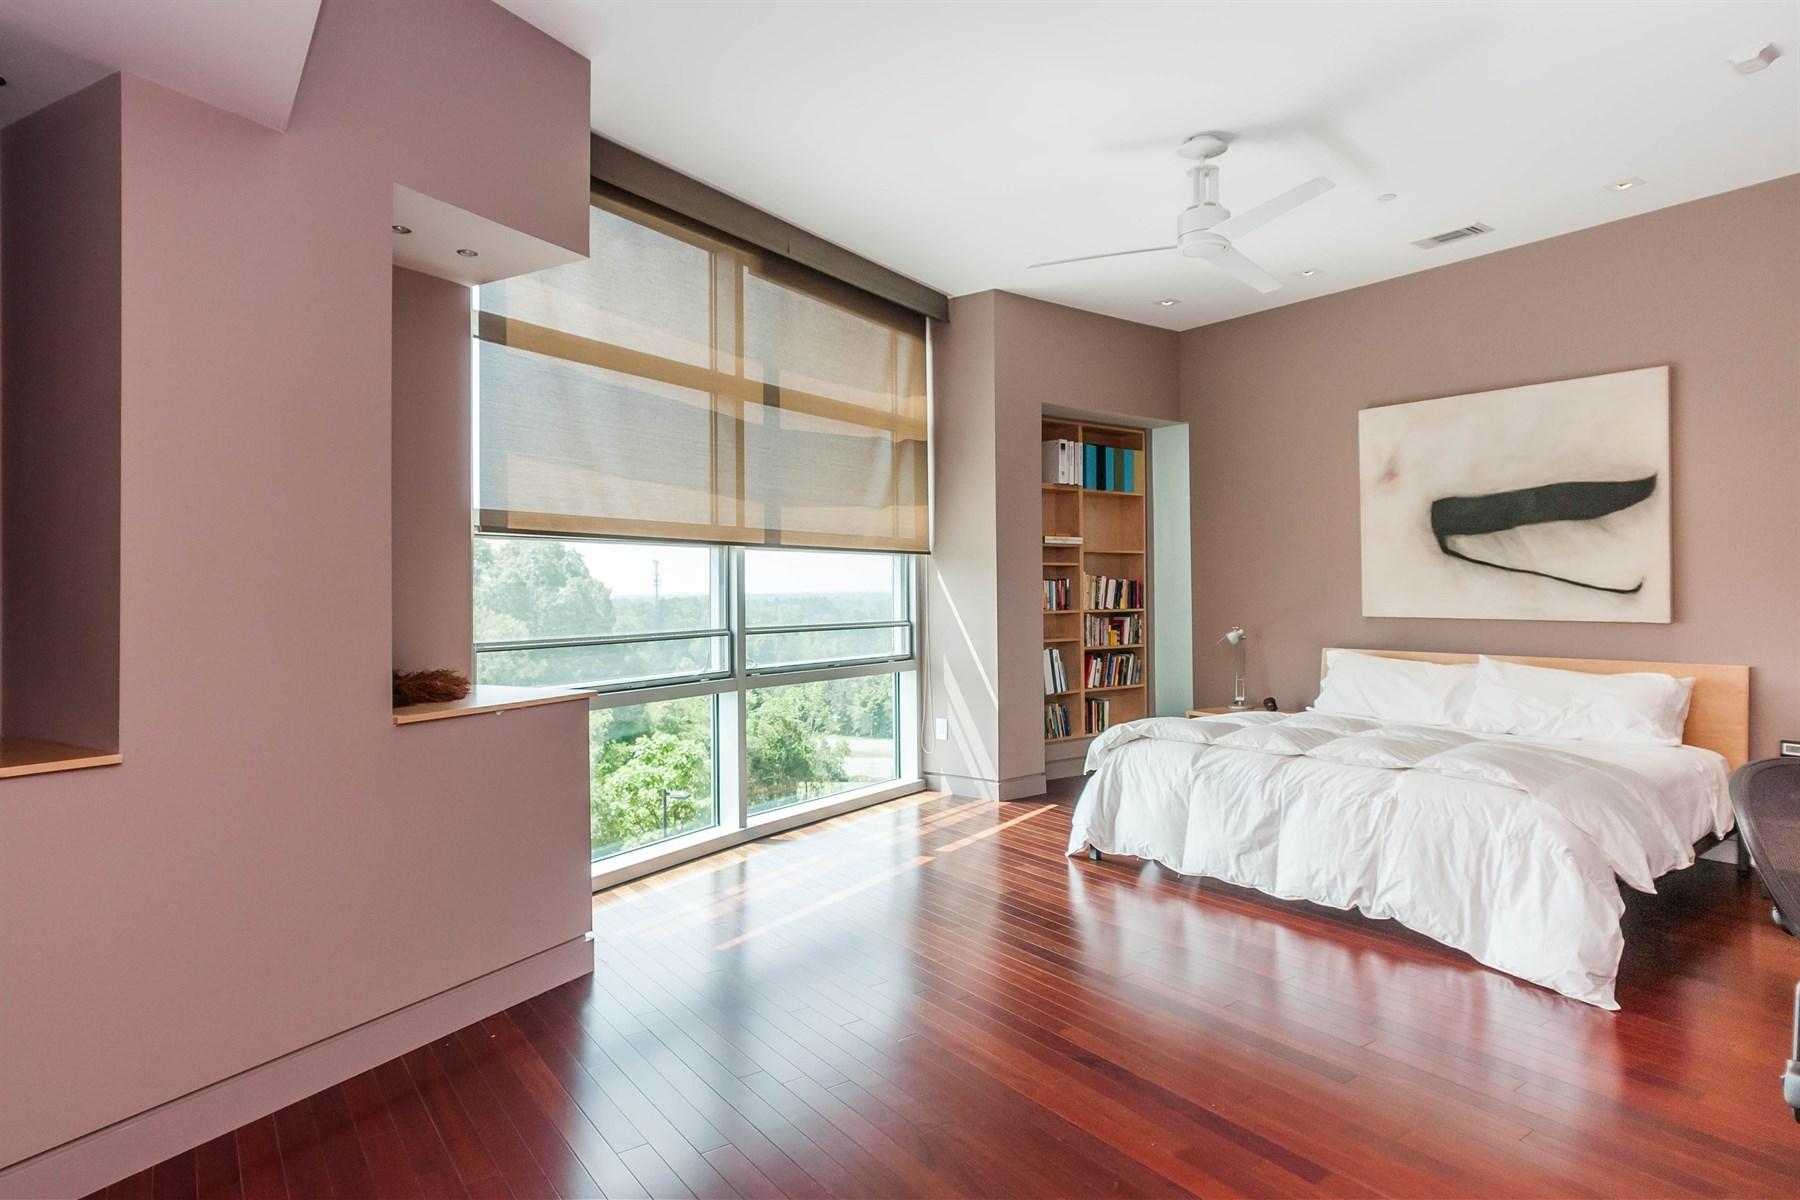 Additional photo for property listing at Meadowmont 331 W Barbee Chapel Road Chapel Hill, Carolina Del Norte 27517 Estados Unidos